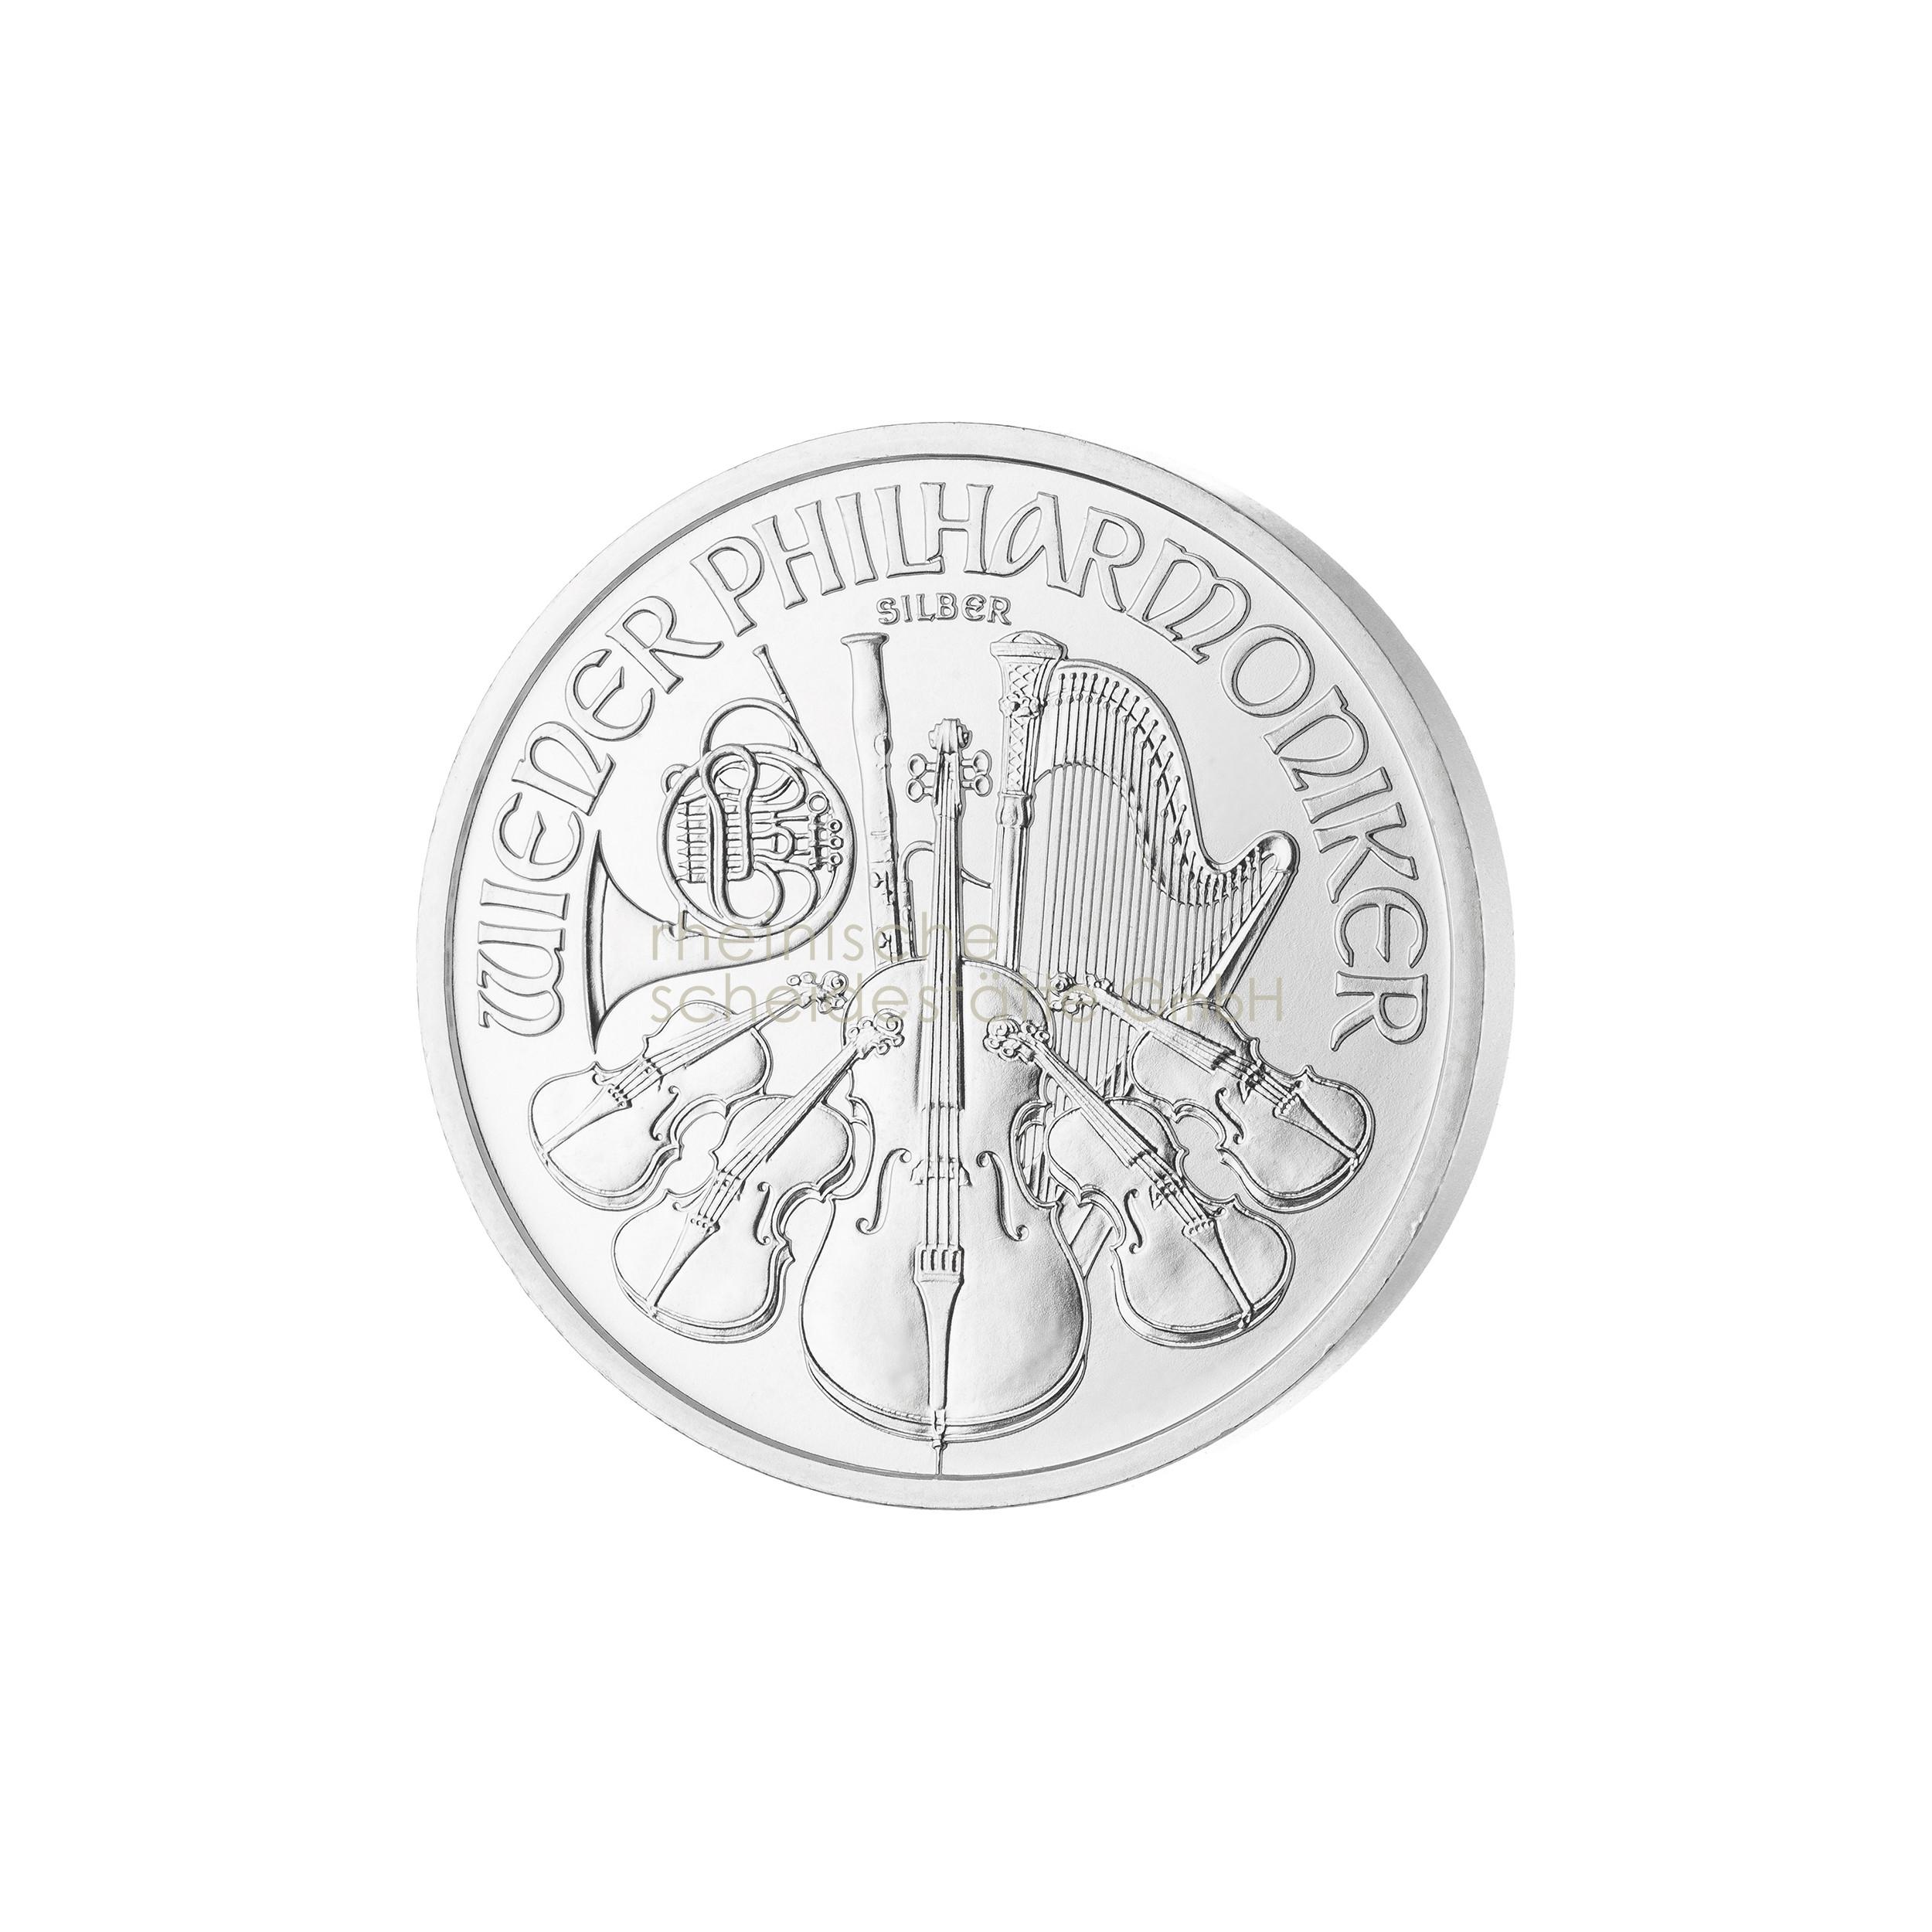 1 Unze Wiener Philarmoniker Silbermünze 2